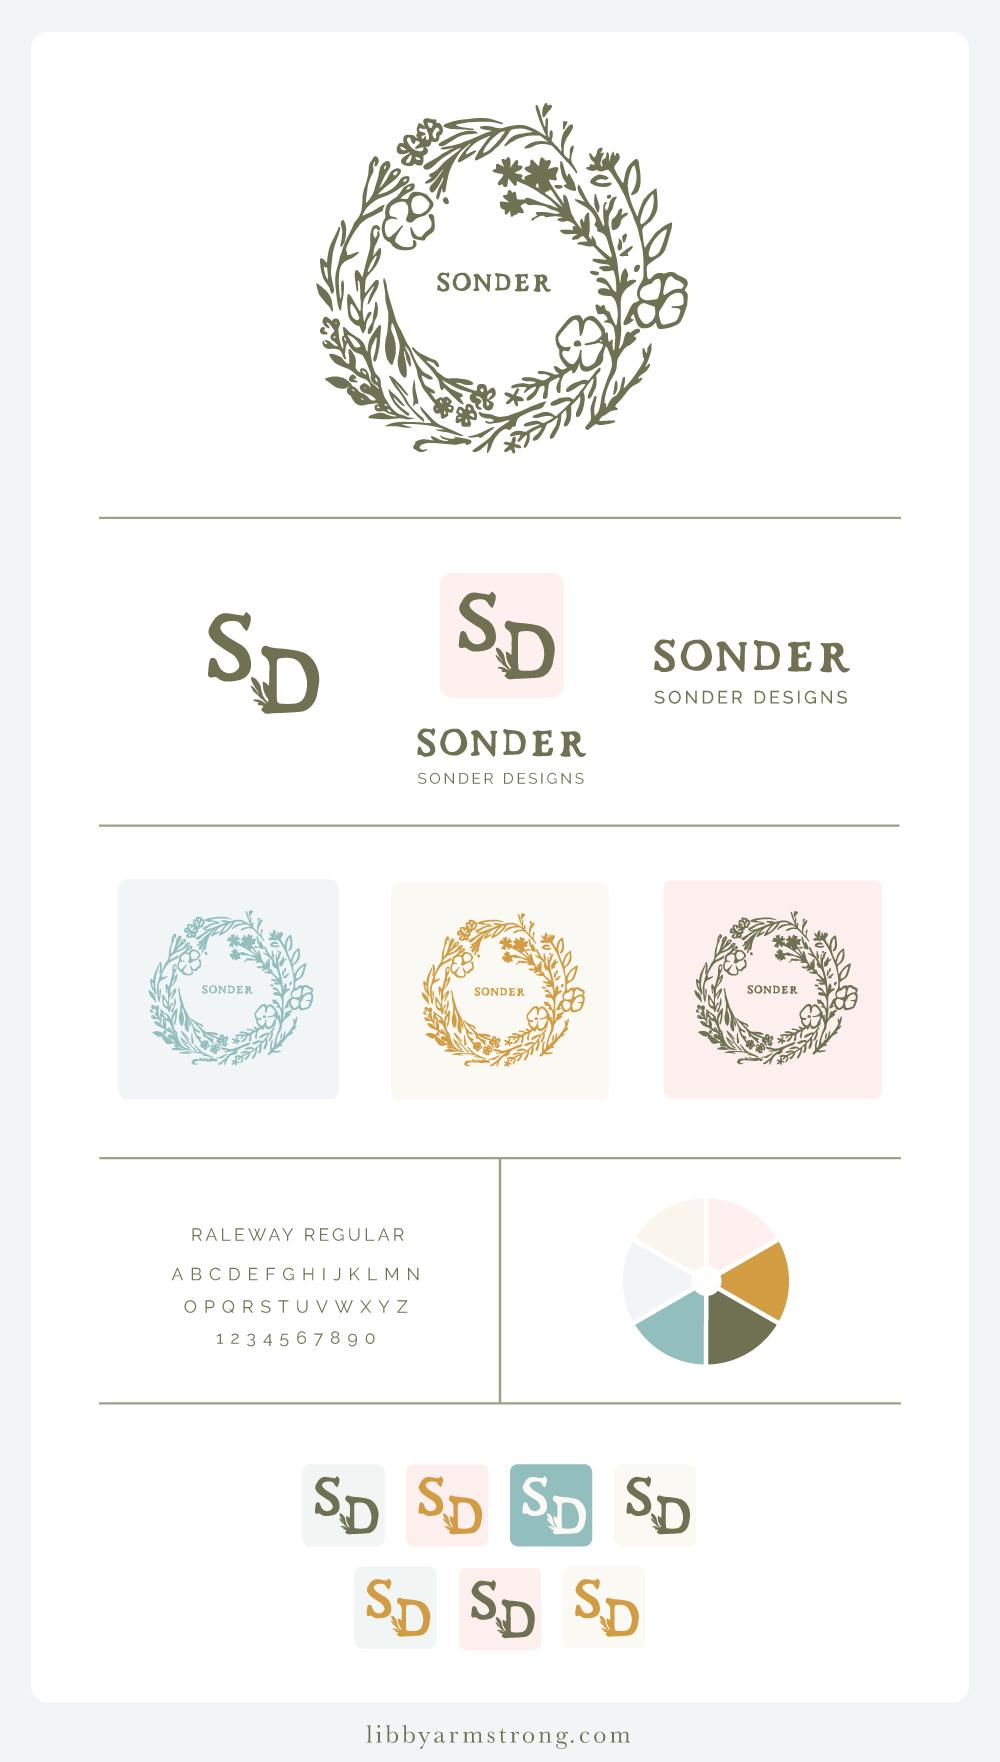 Sonder Logo Variations - Libby Armstrong Creative Design